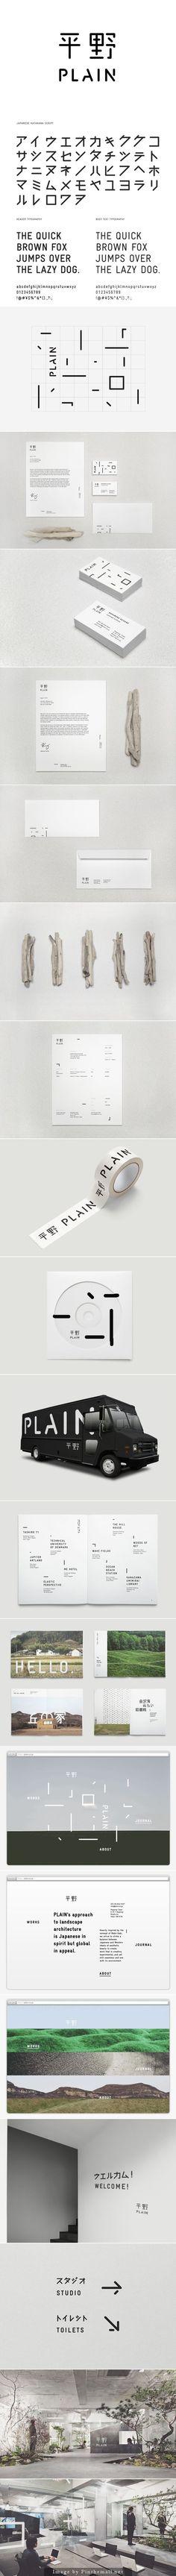 PLAIN by Sidney Lim YX, via Behance